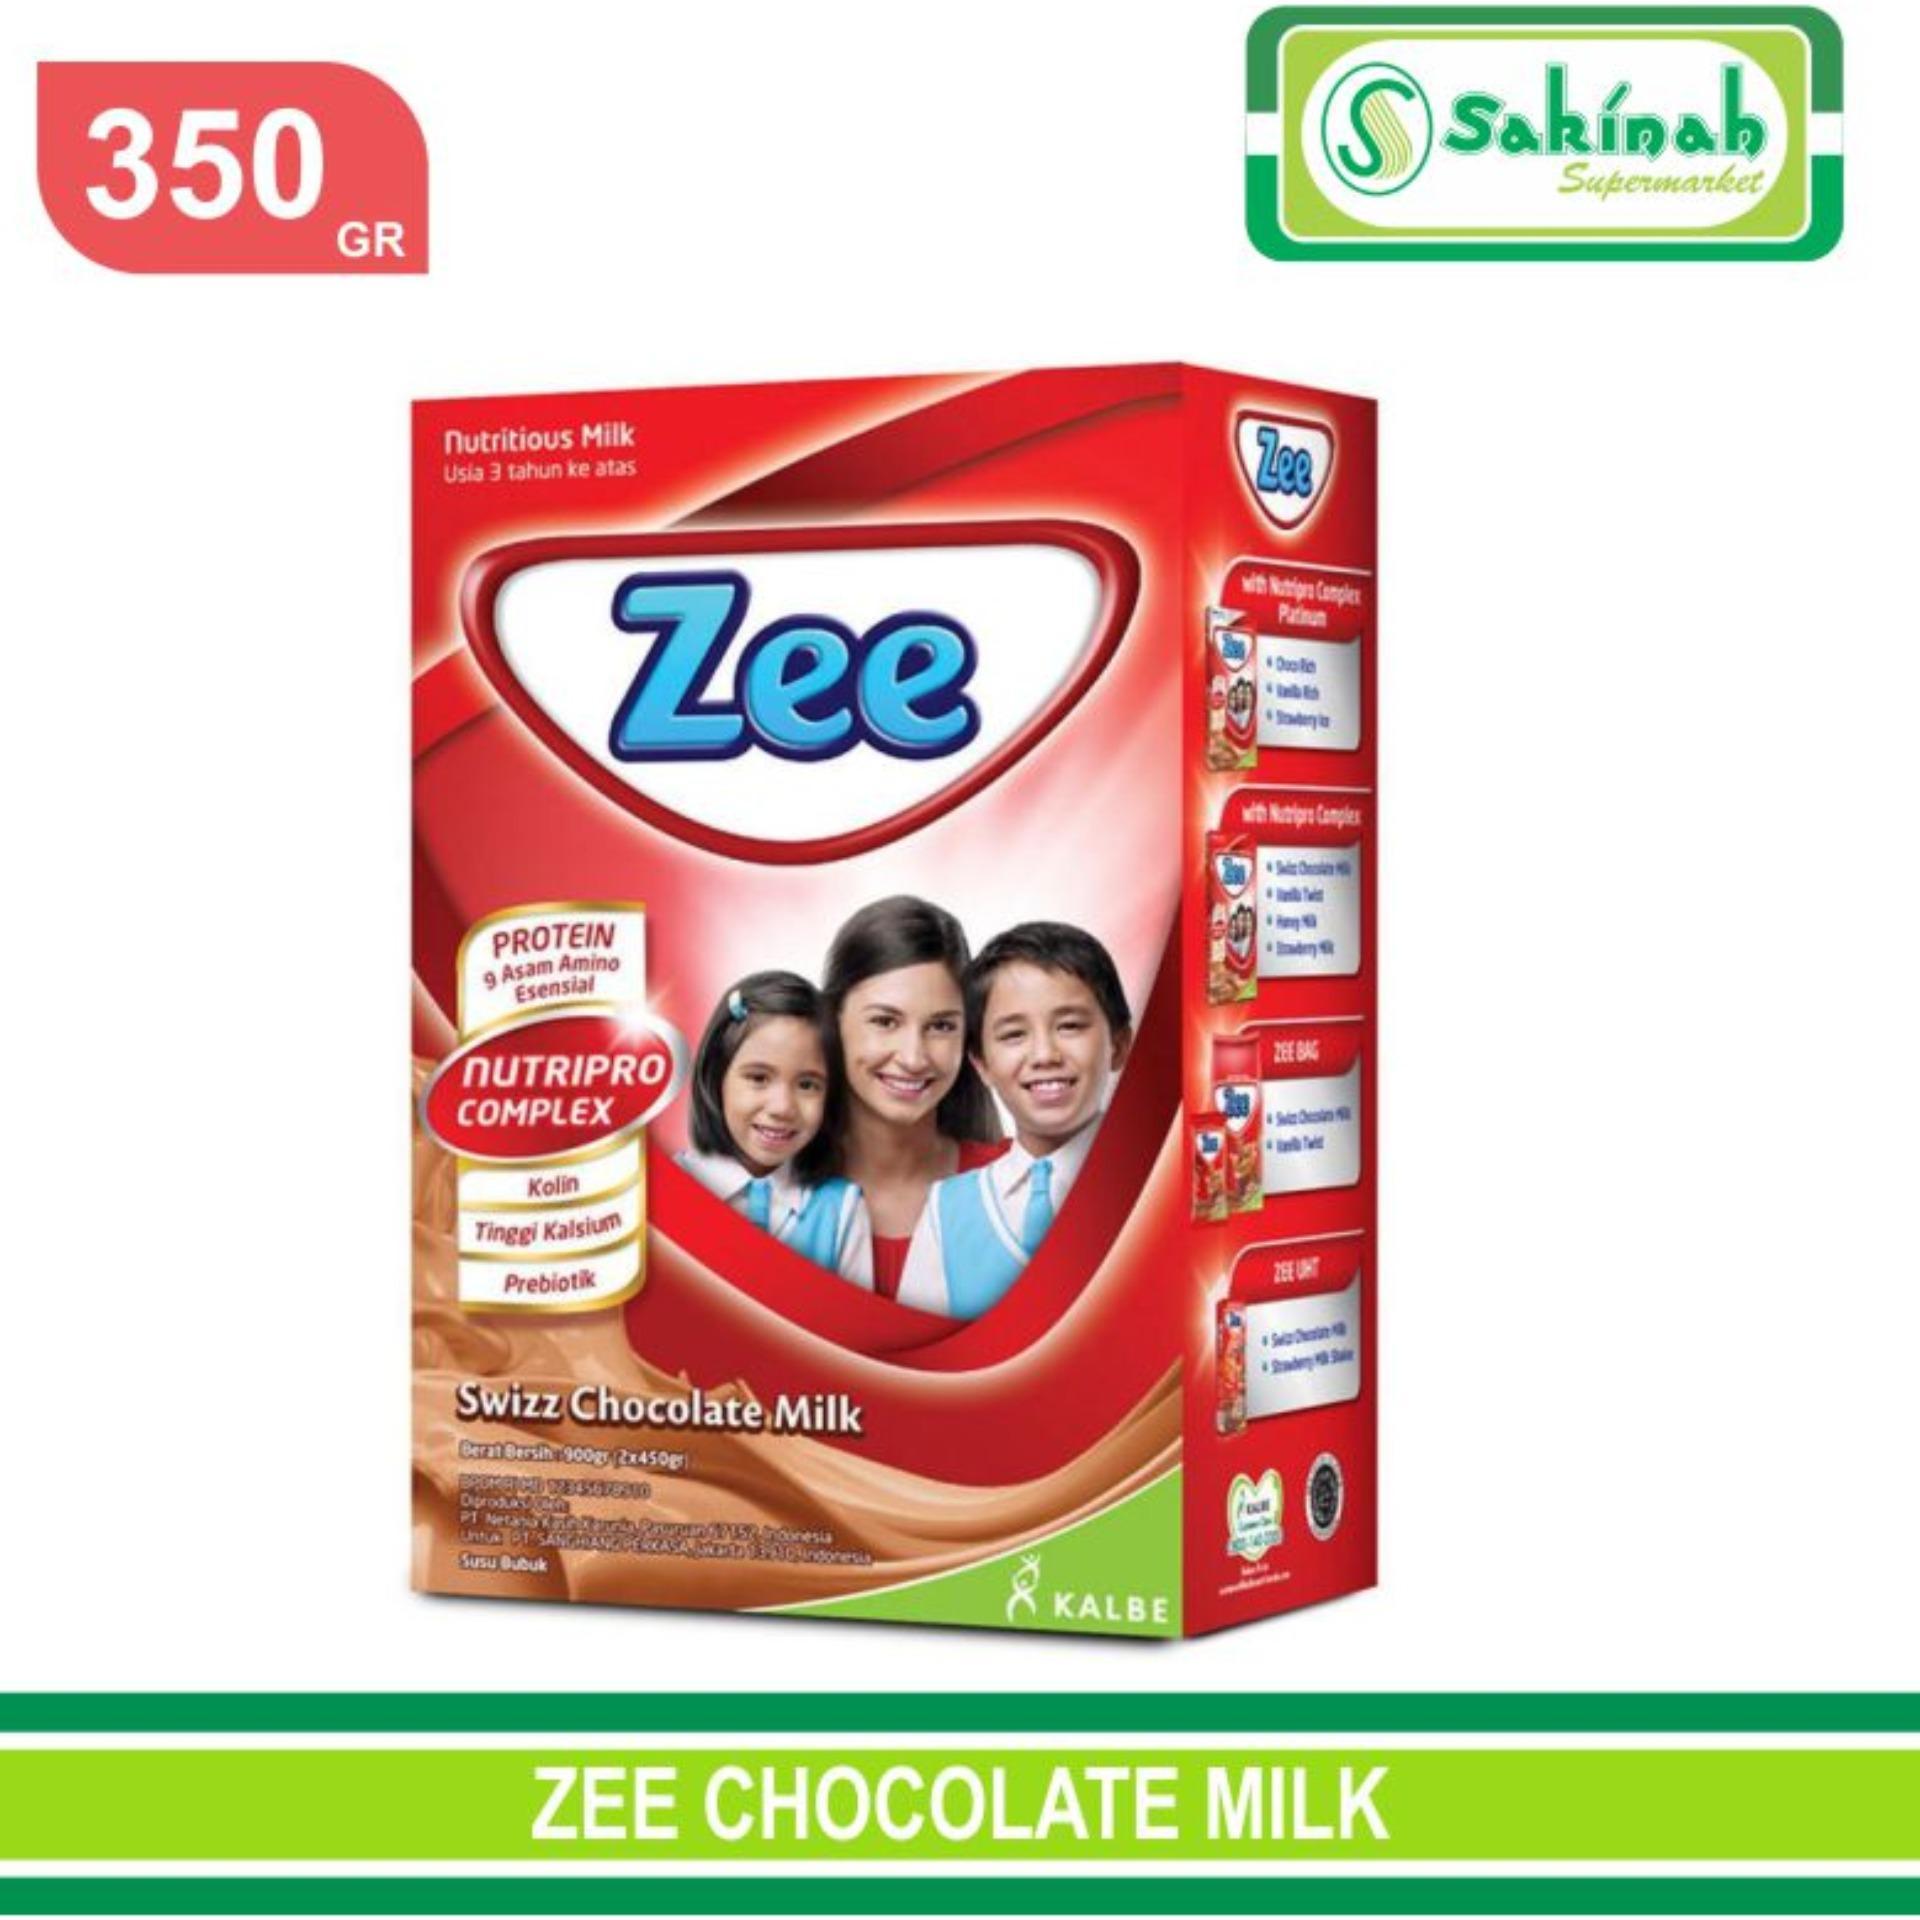 ZEE CHOCOLATE 350GR SUSU PERTUMBUHAN